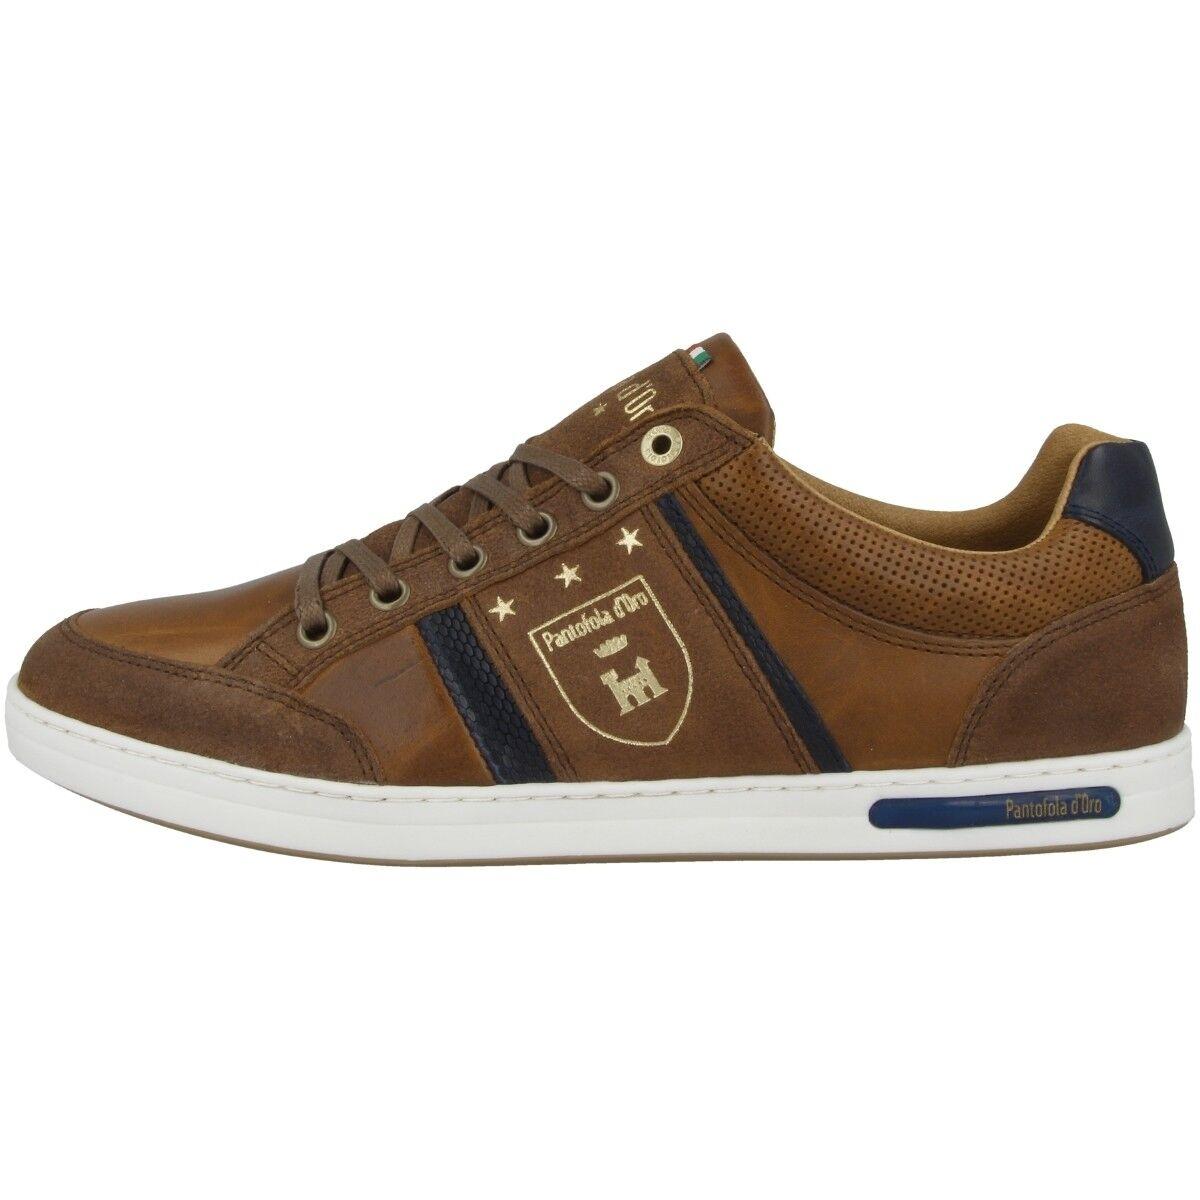 Pantofola D gold Mondovi men Low shoes Sneaker men Tortoise Shell 10191017.JCU